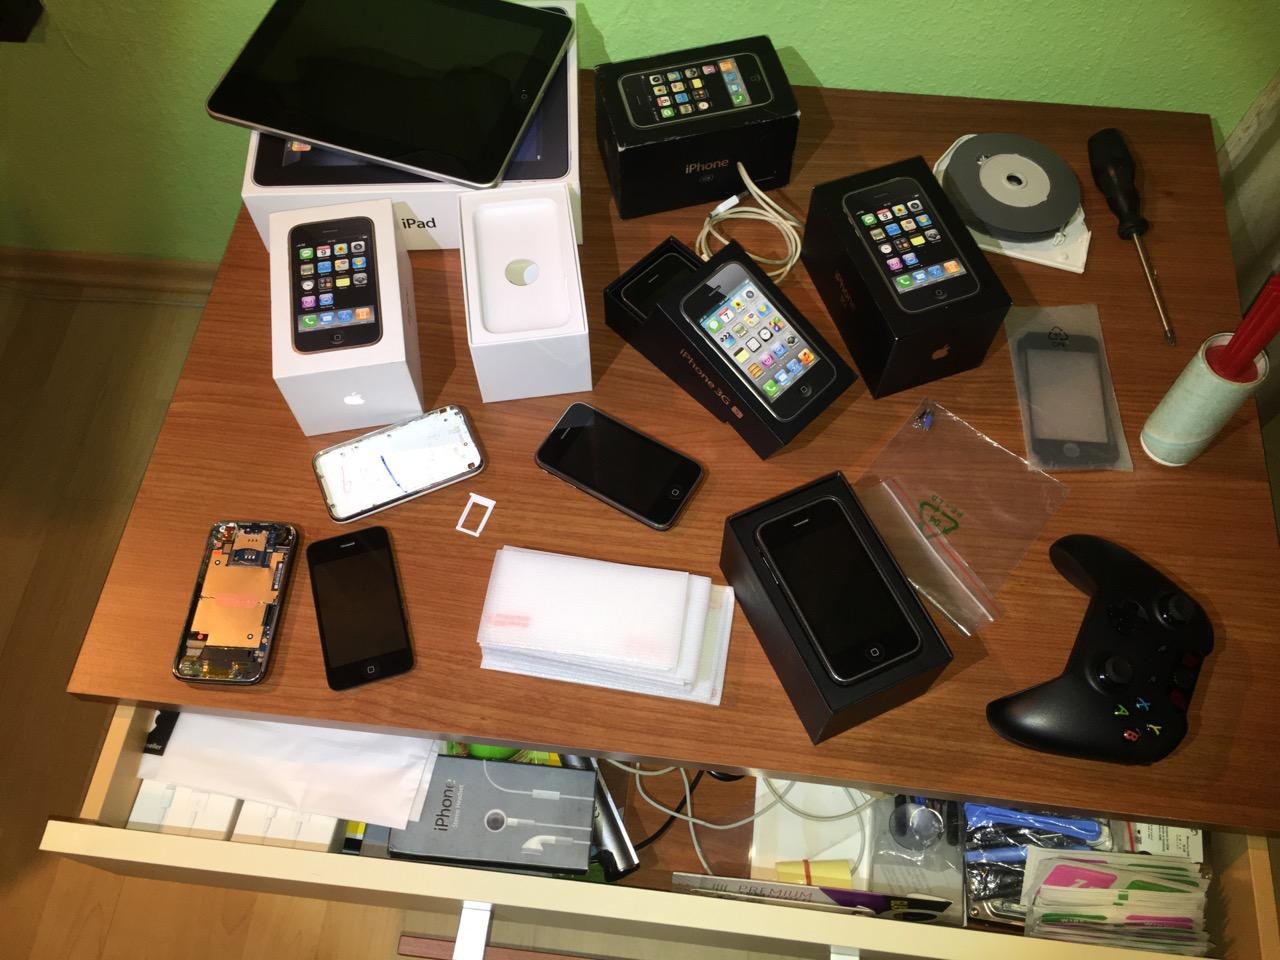 almak-alkatreszek-iPhoneok